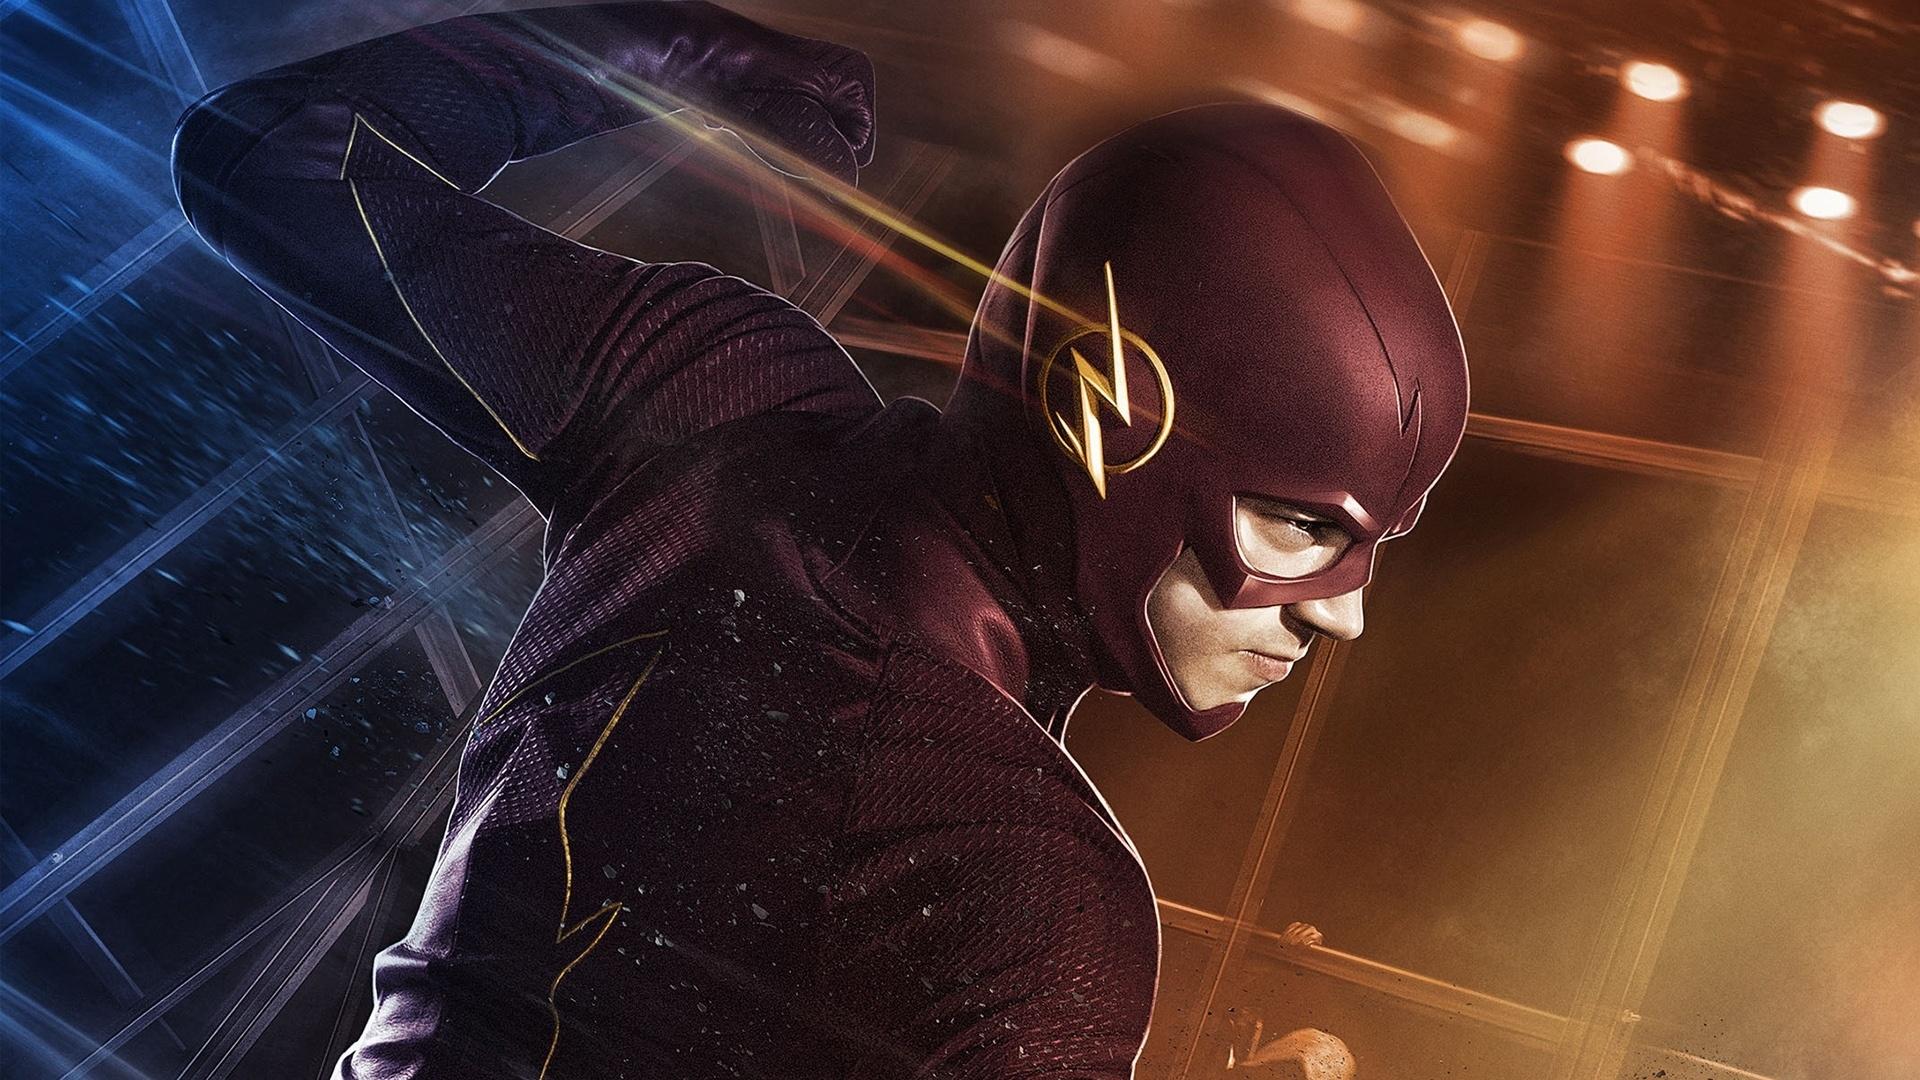 The Flash free wallpaper